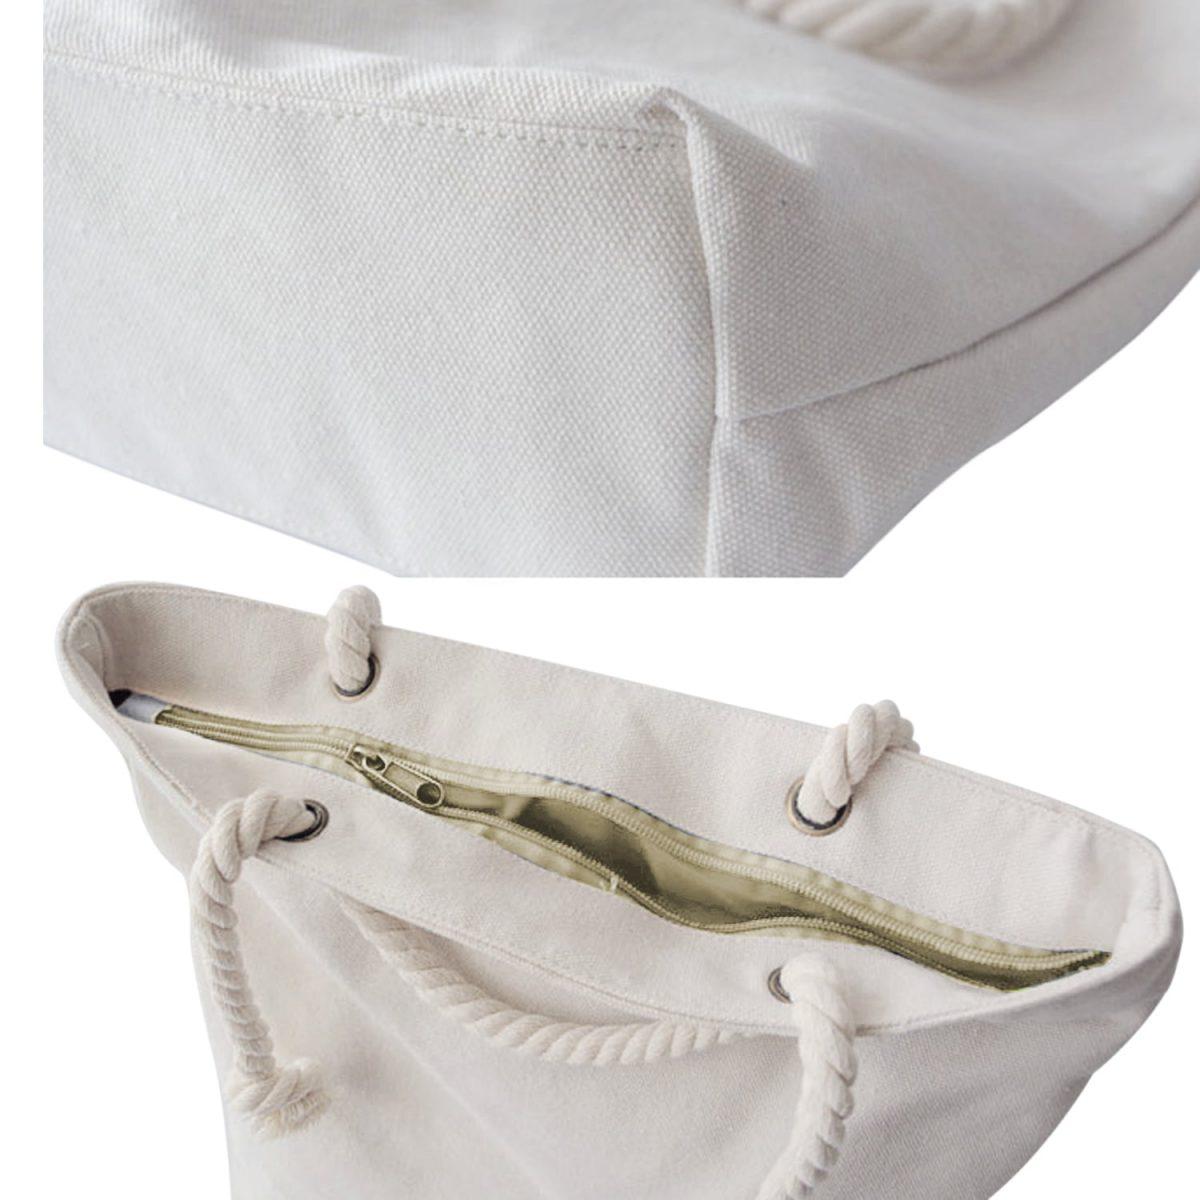 Leopar Gül Motifli Fermuarlı Modern Kumaş Çanta Realhomes